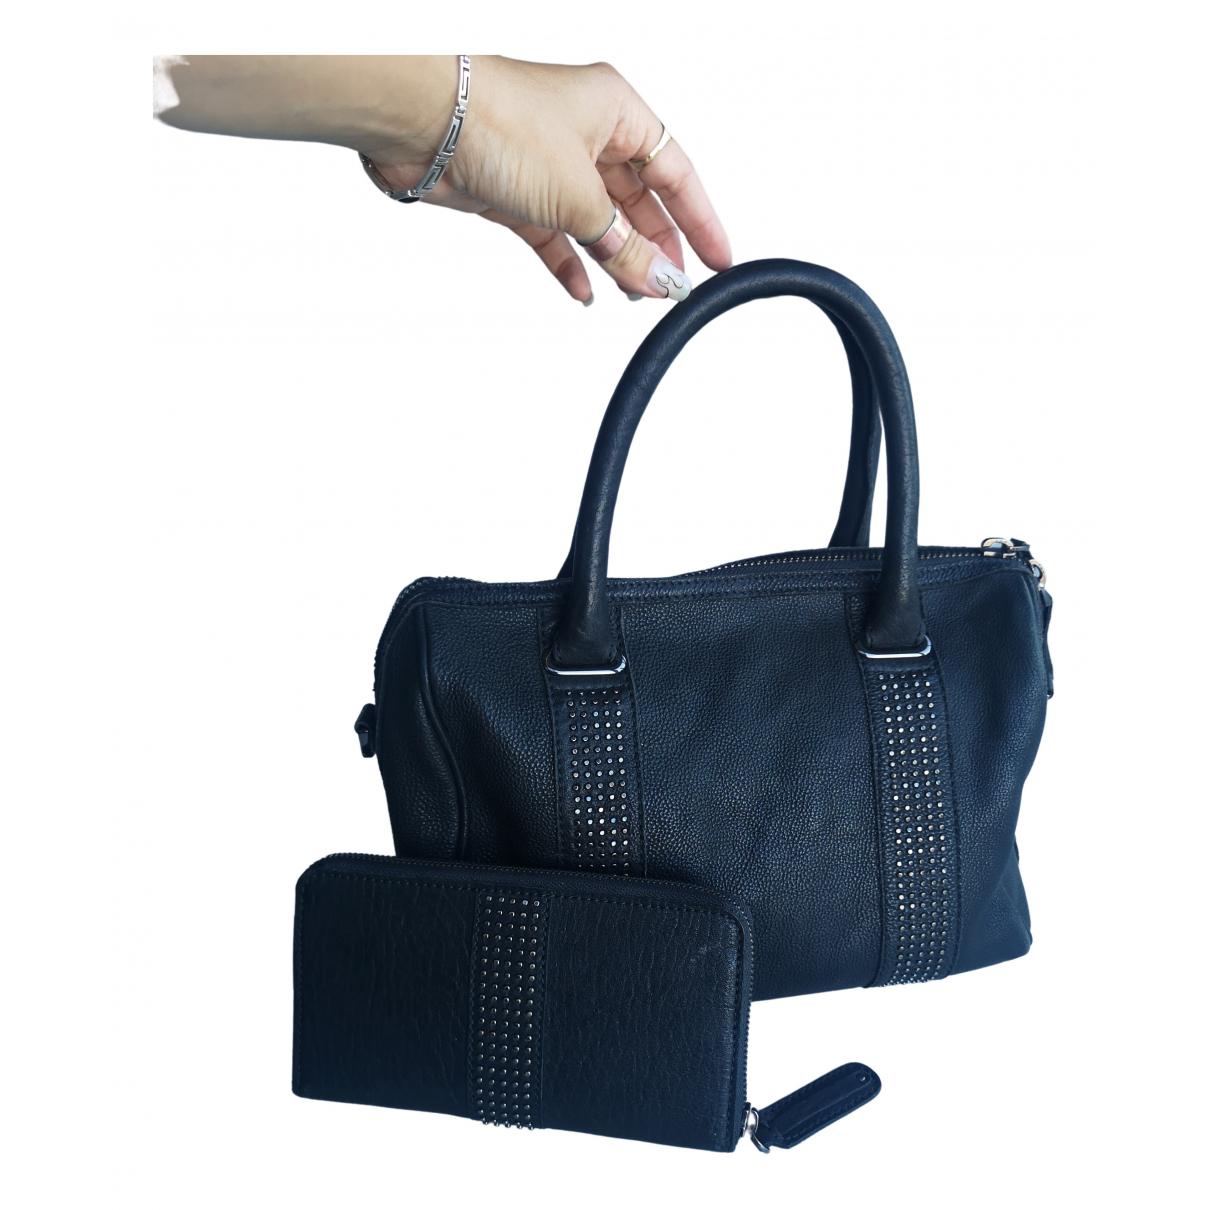 Comptoir Des Cotonniers \N Black Leather handbag for Women \N